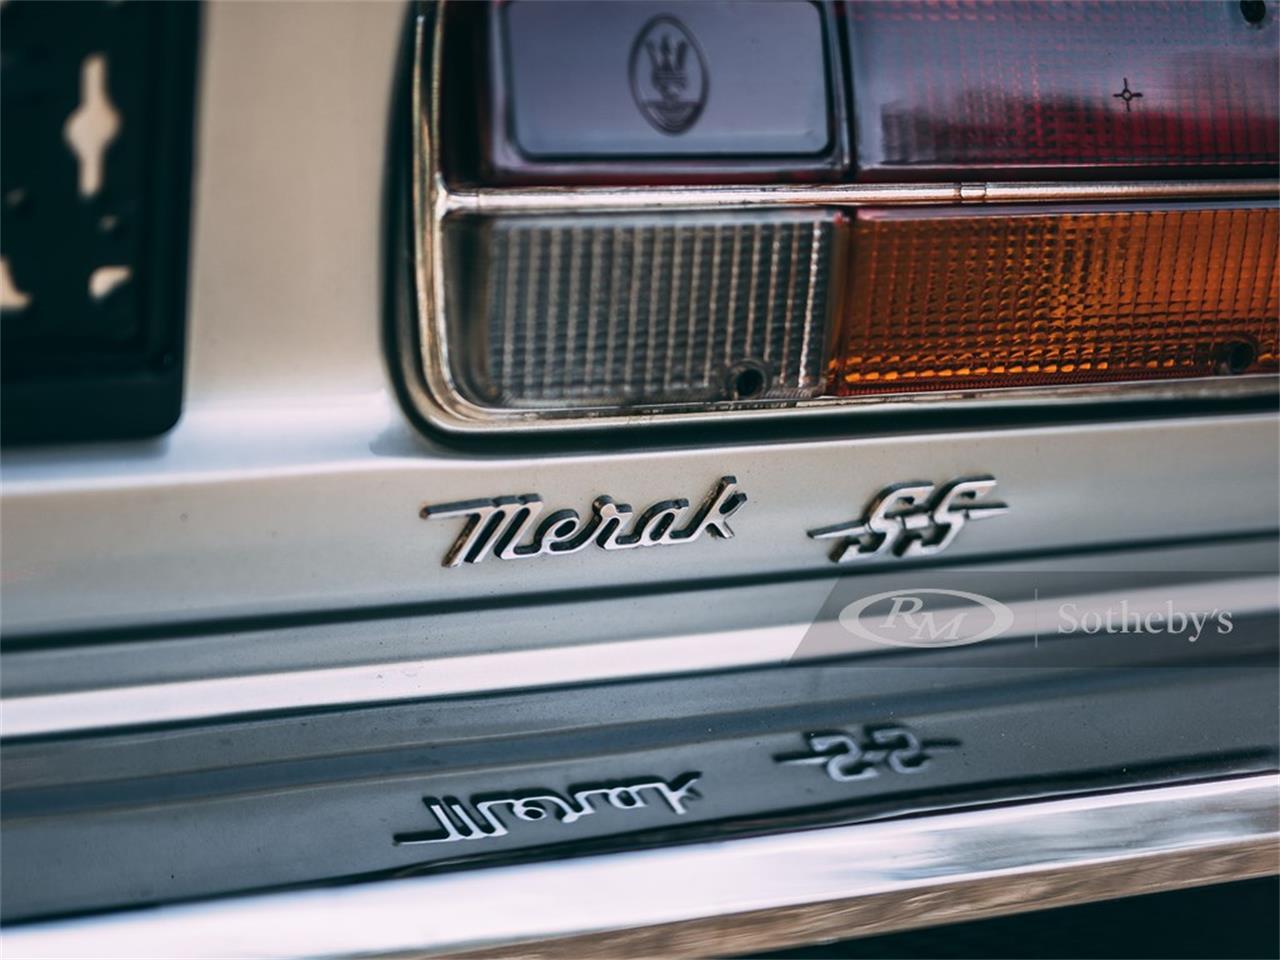 1979 Maserati Merak SS (CC-1413899) for sale in London, United Kingdom